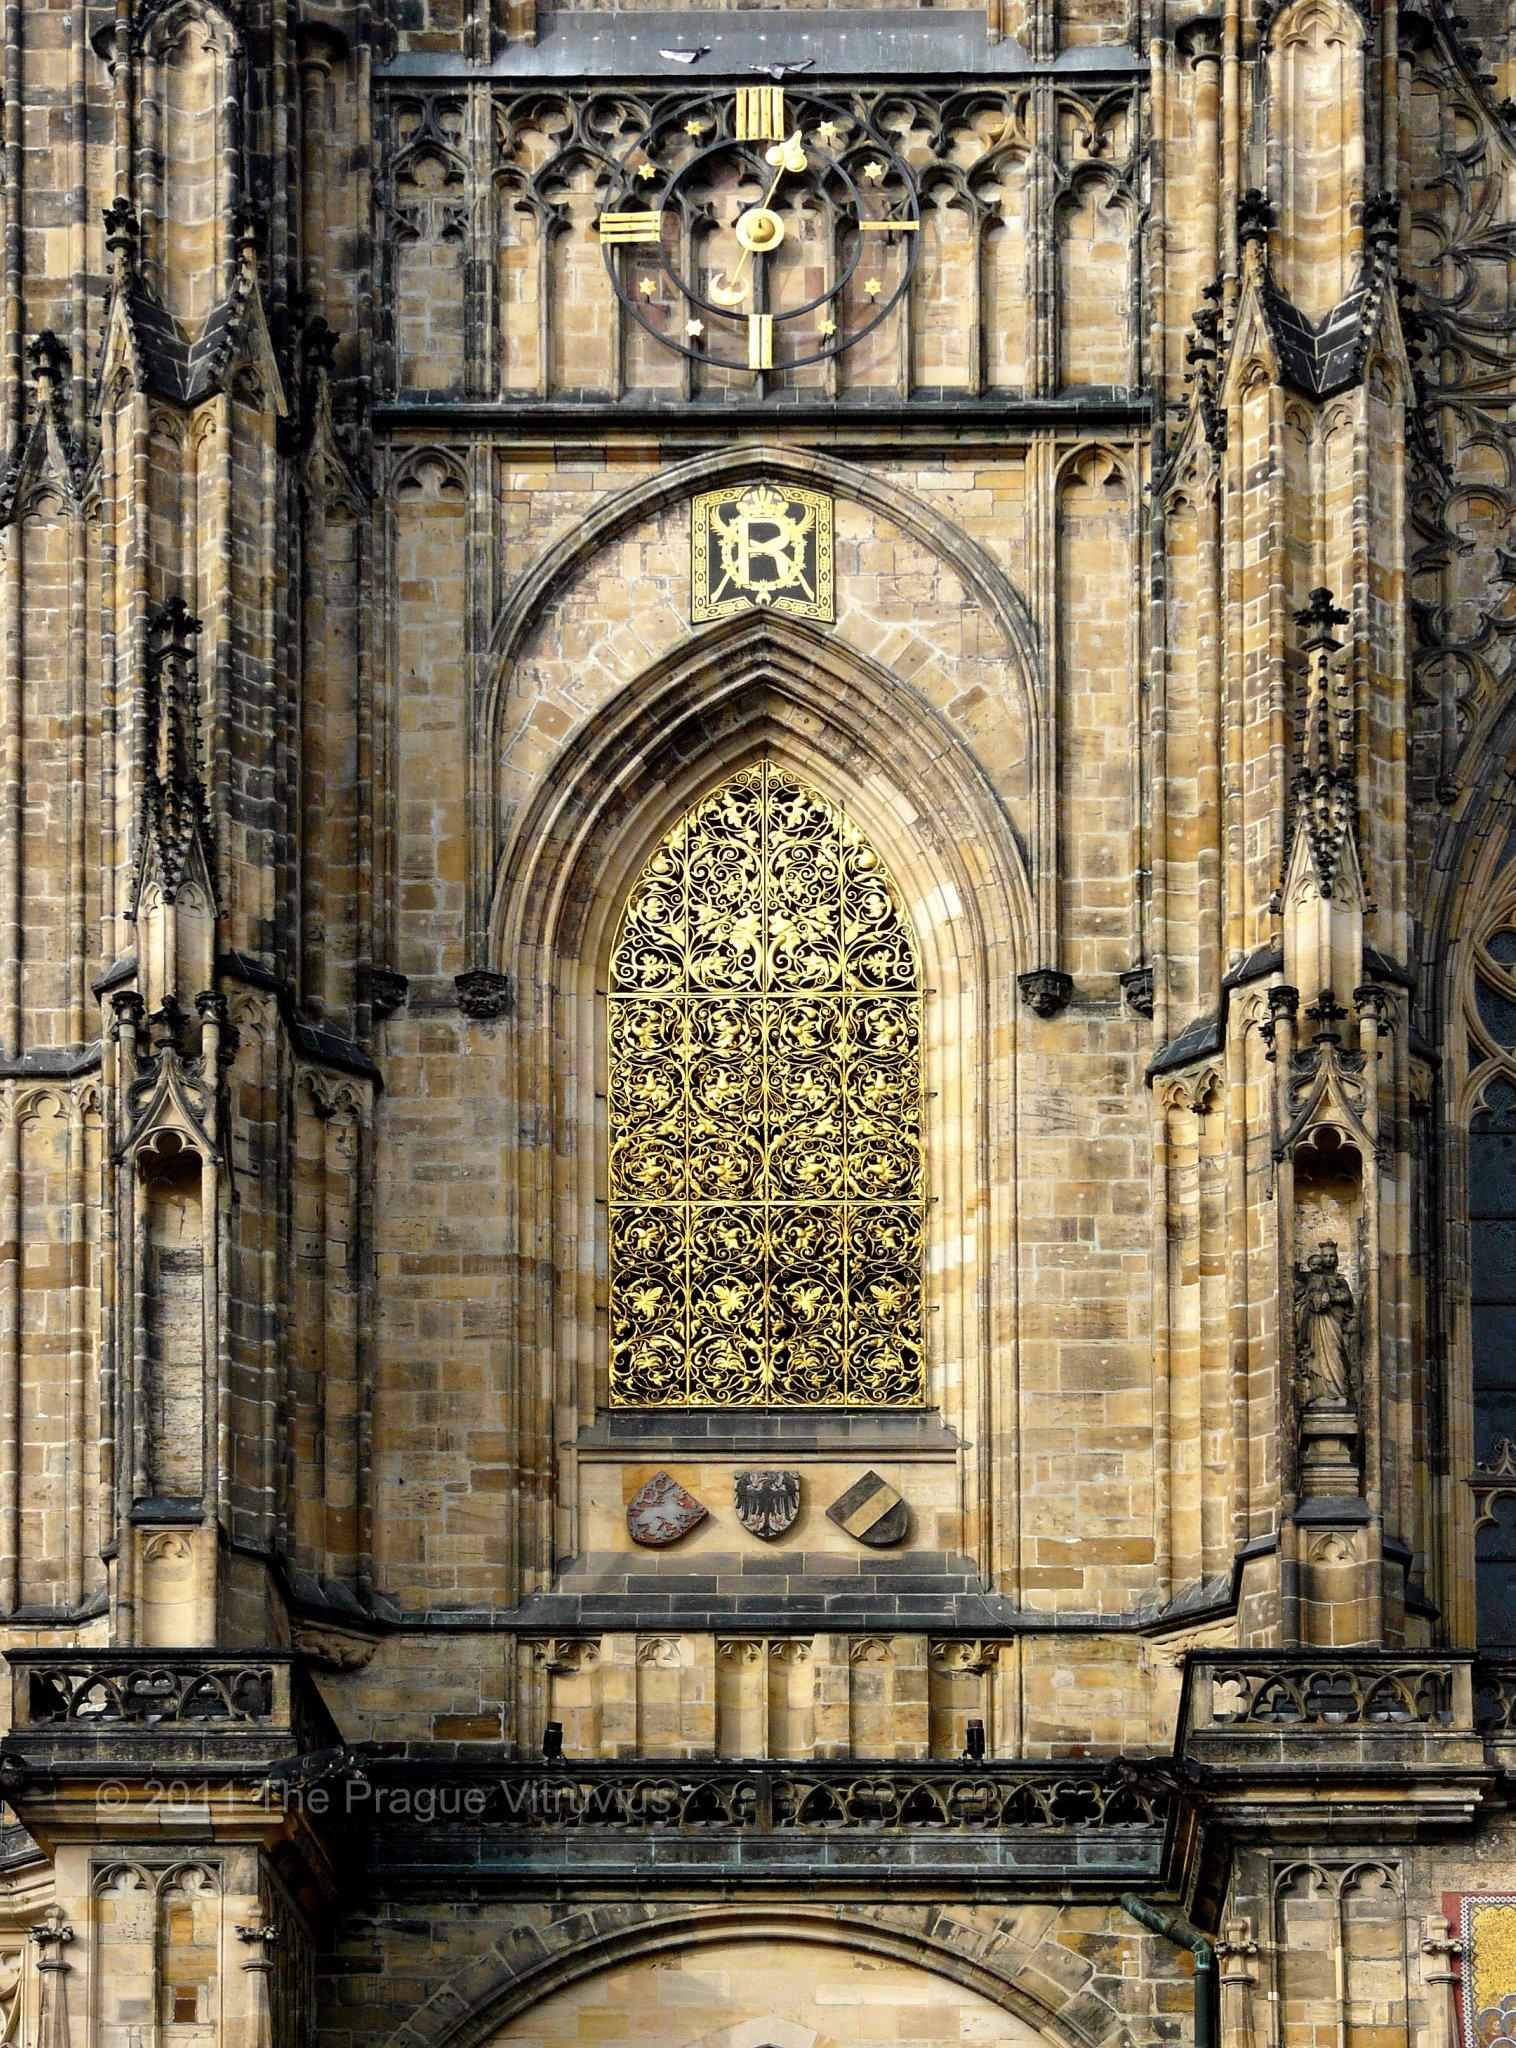 Tower of Saint Vitus Cathedral, Prague Castle